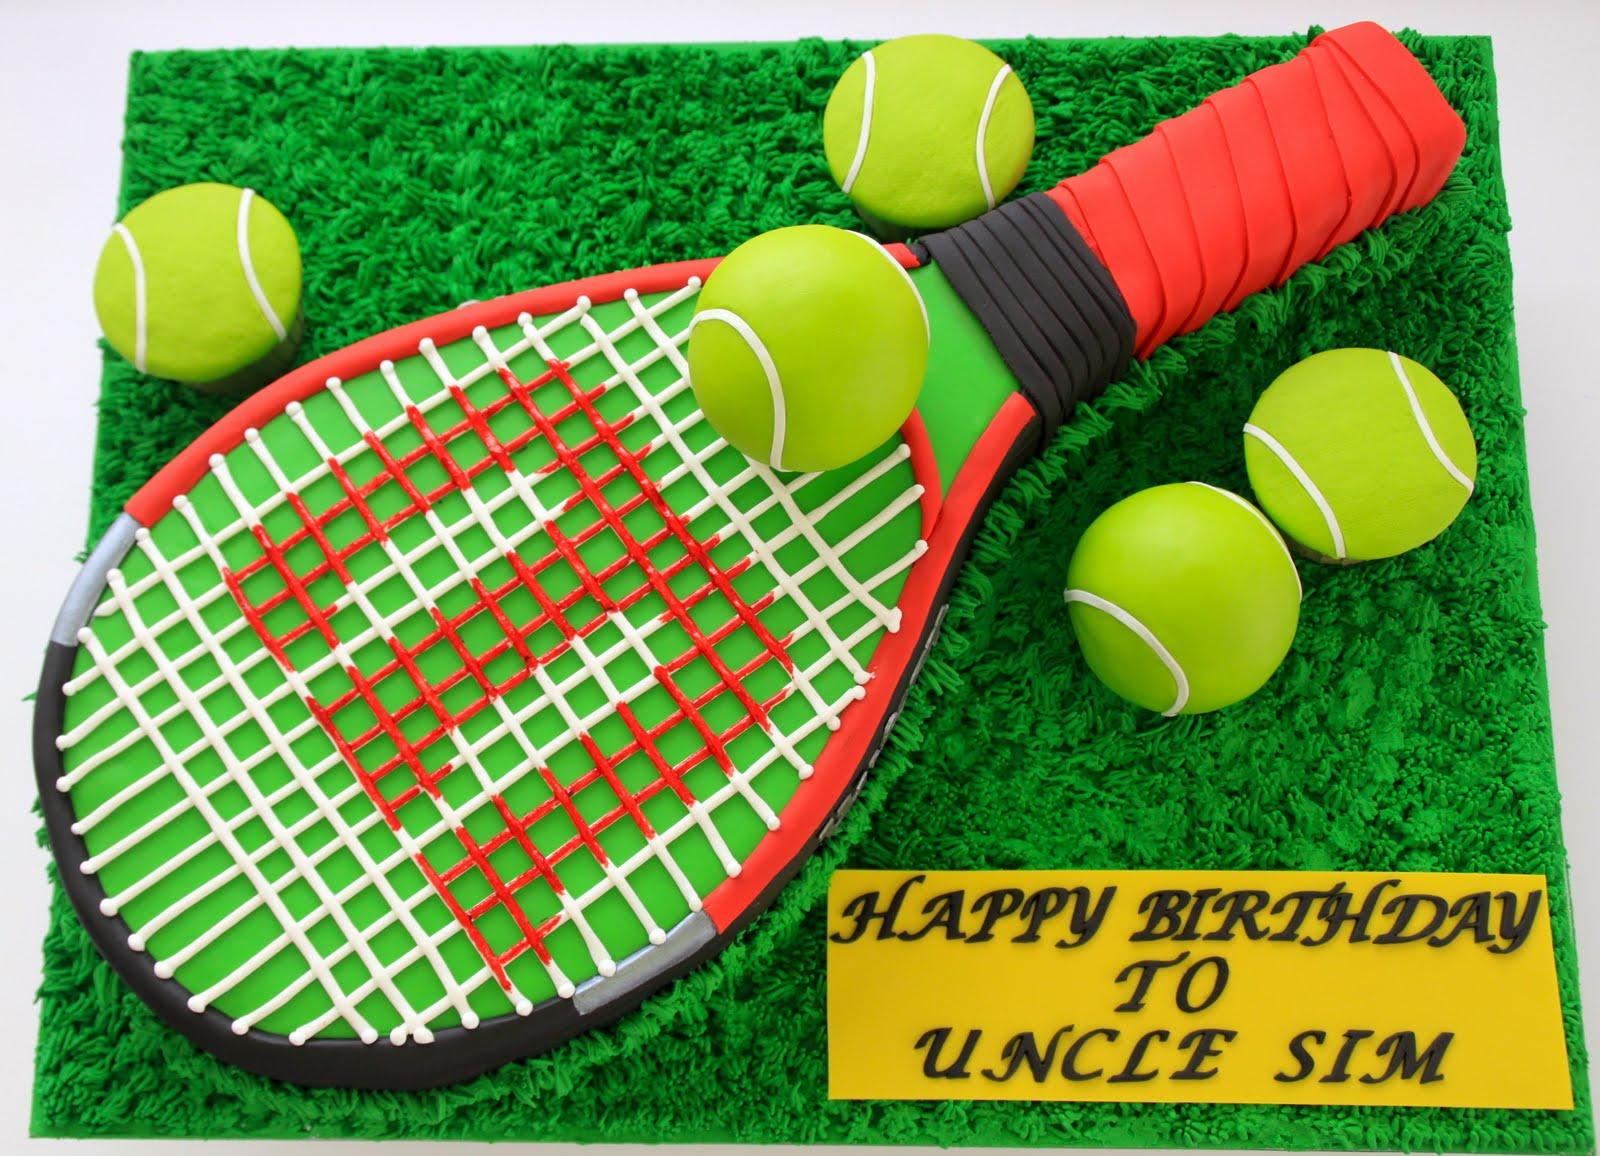 How To Make A Tennis Racket Cake